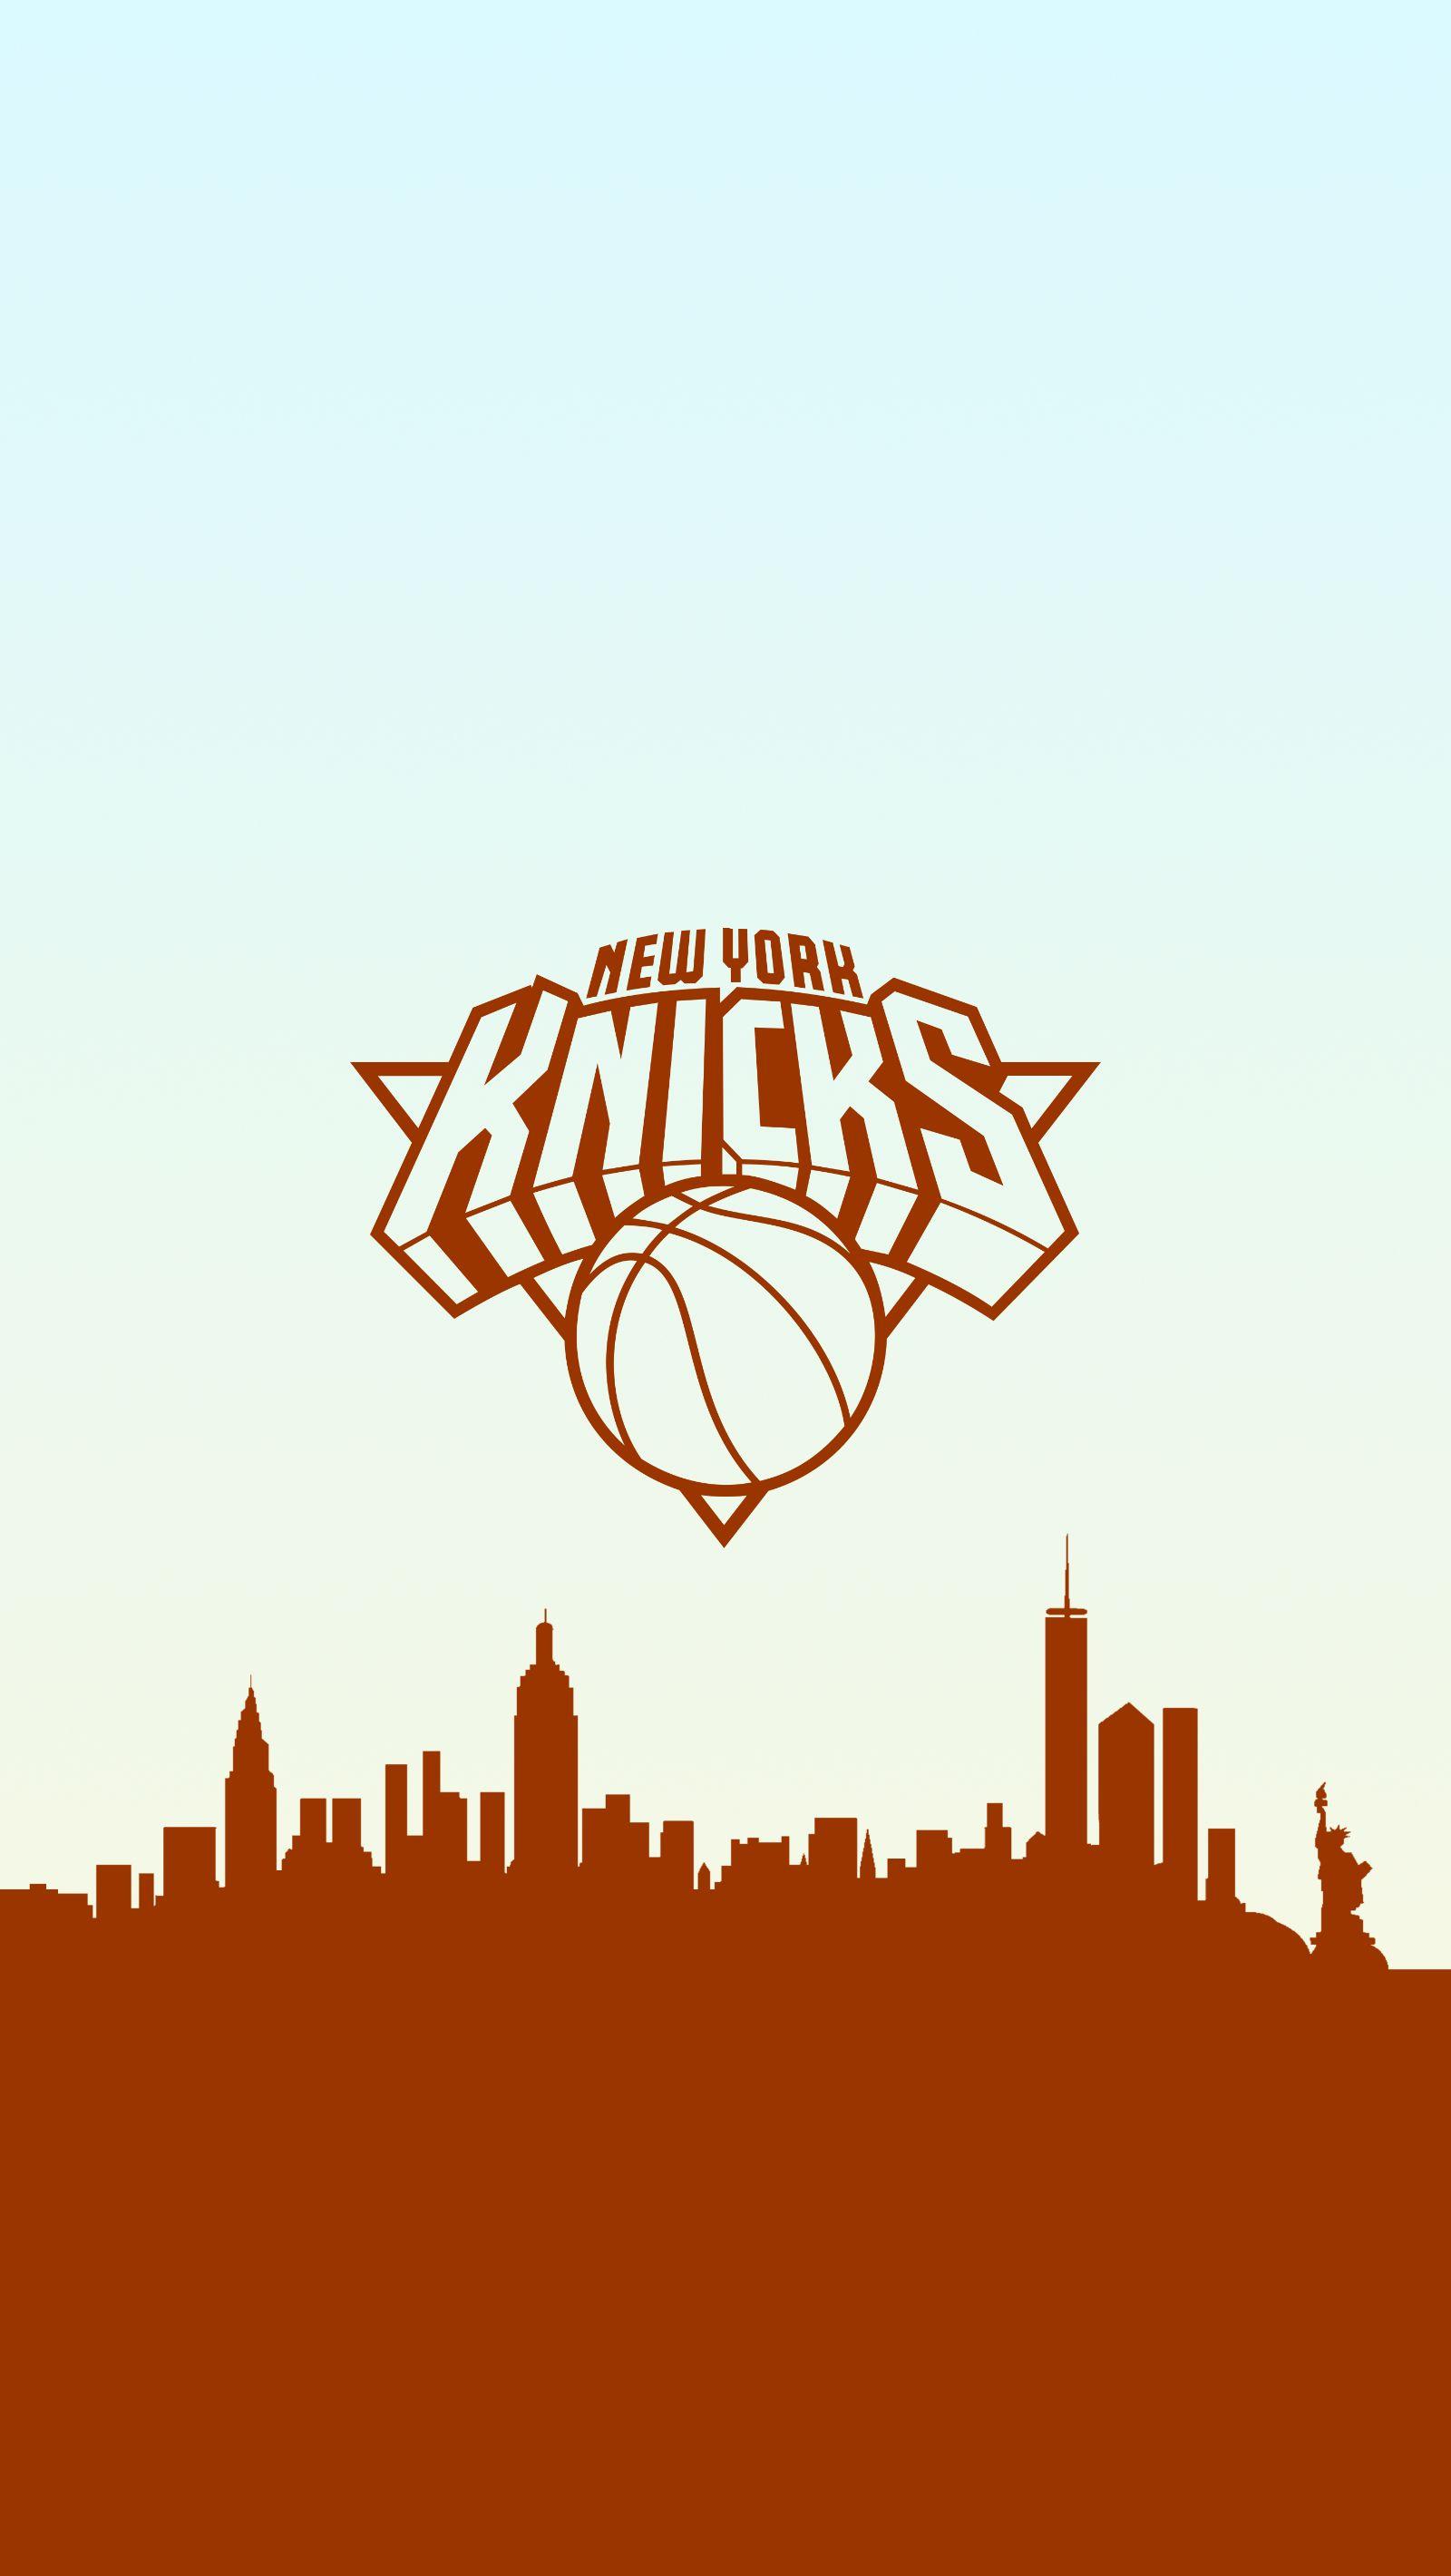 New York Knicks Basketball Phone Background Chicago Bulls Wallpaper Basketball Wallpaper New York Knicks